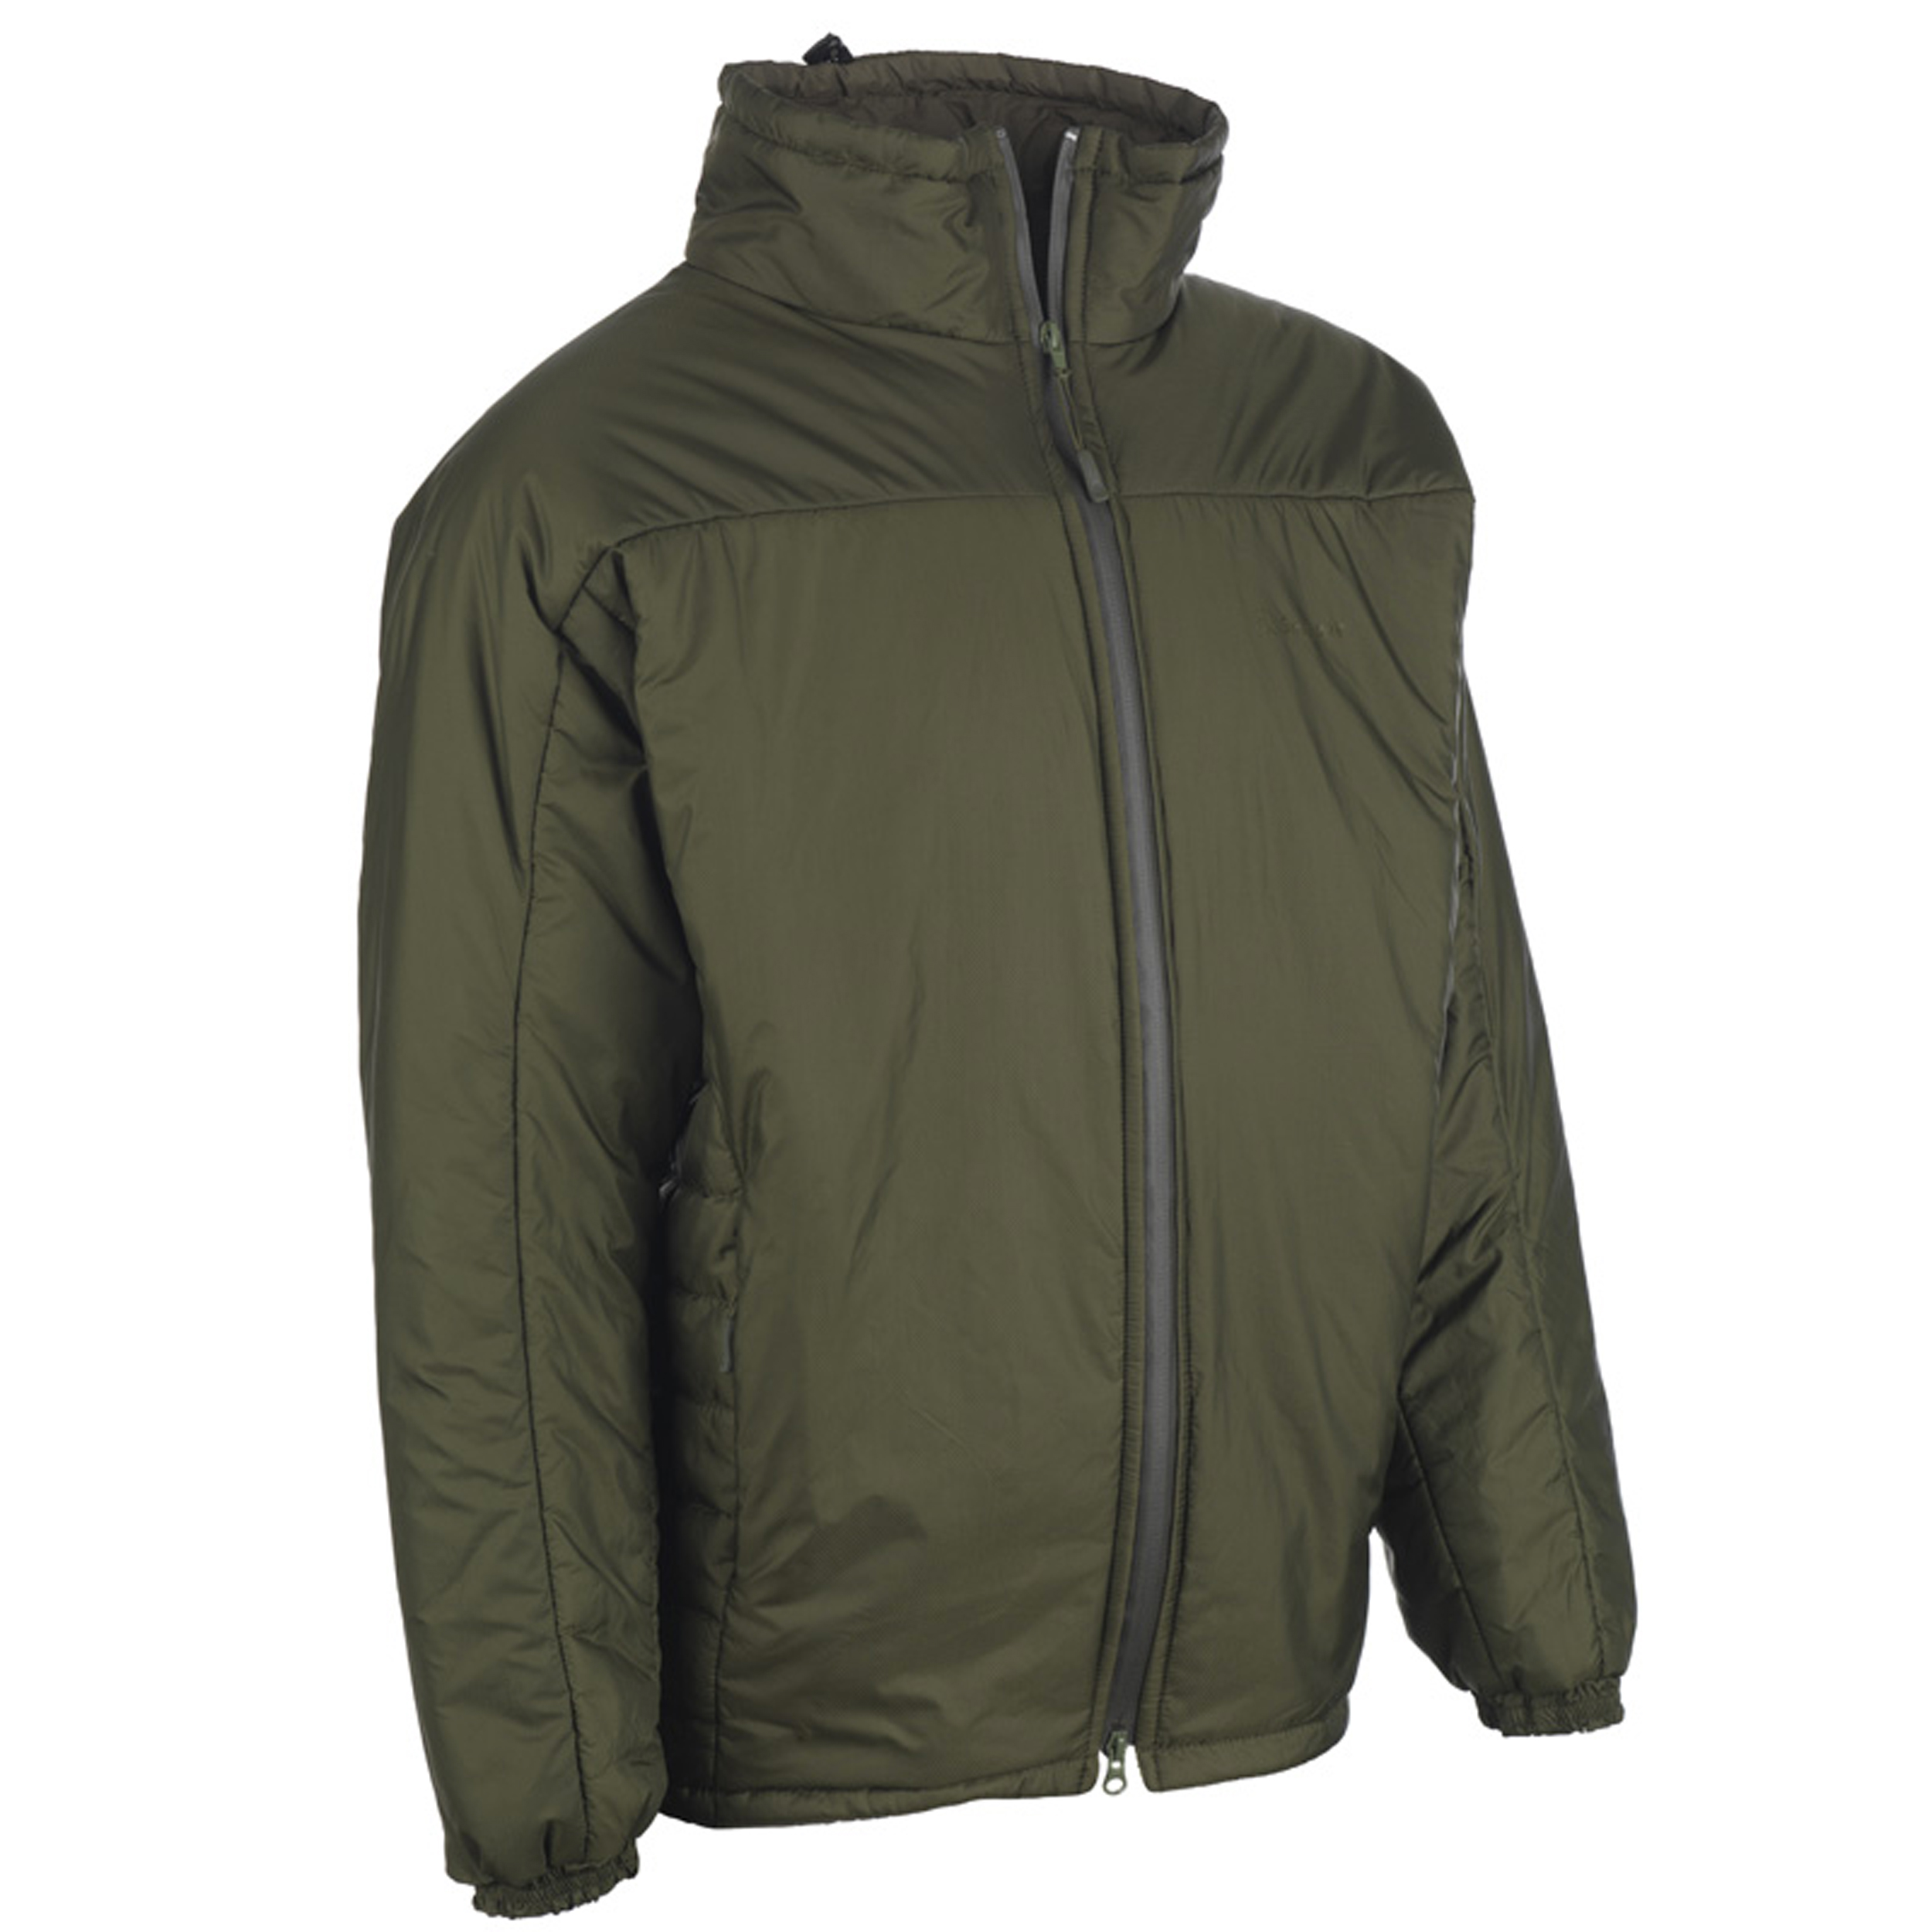 Snugpak Sj6 Jacket Olive Sm